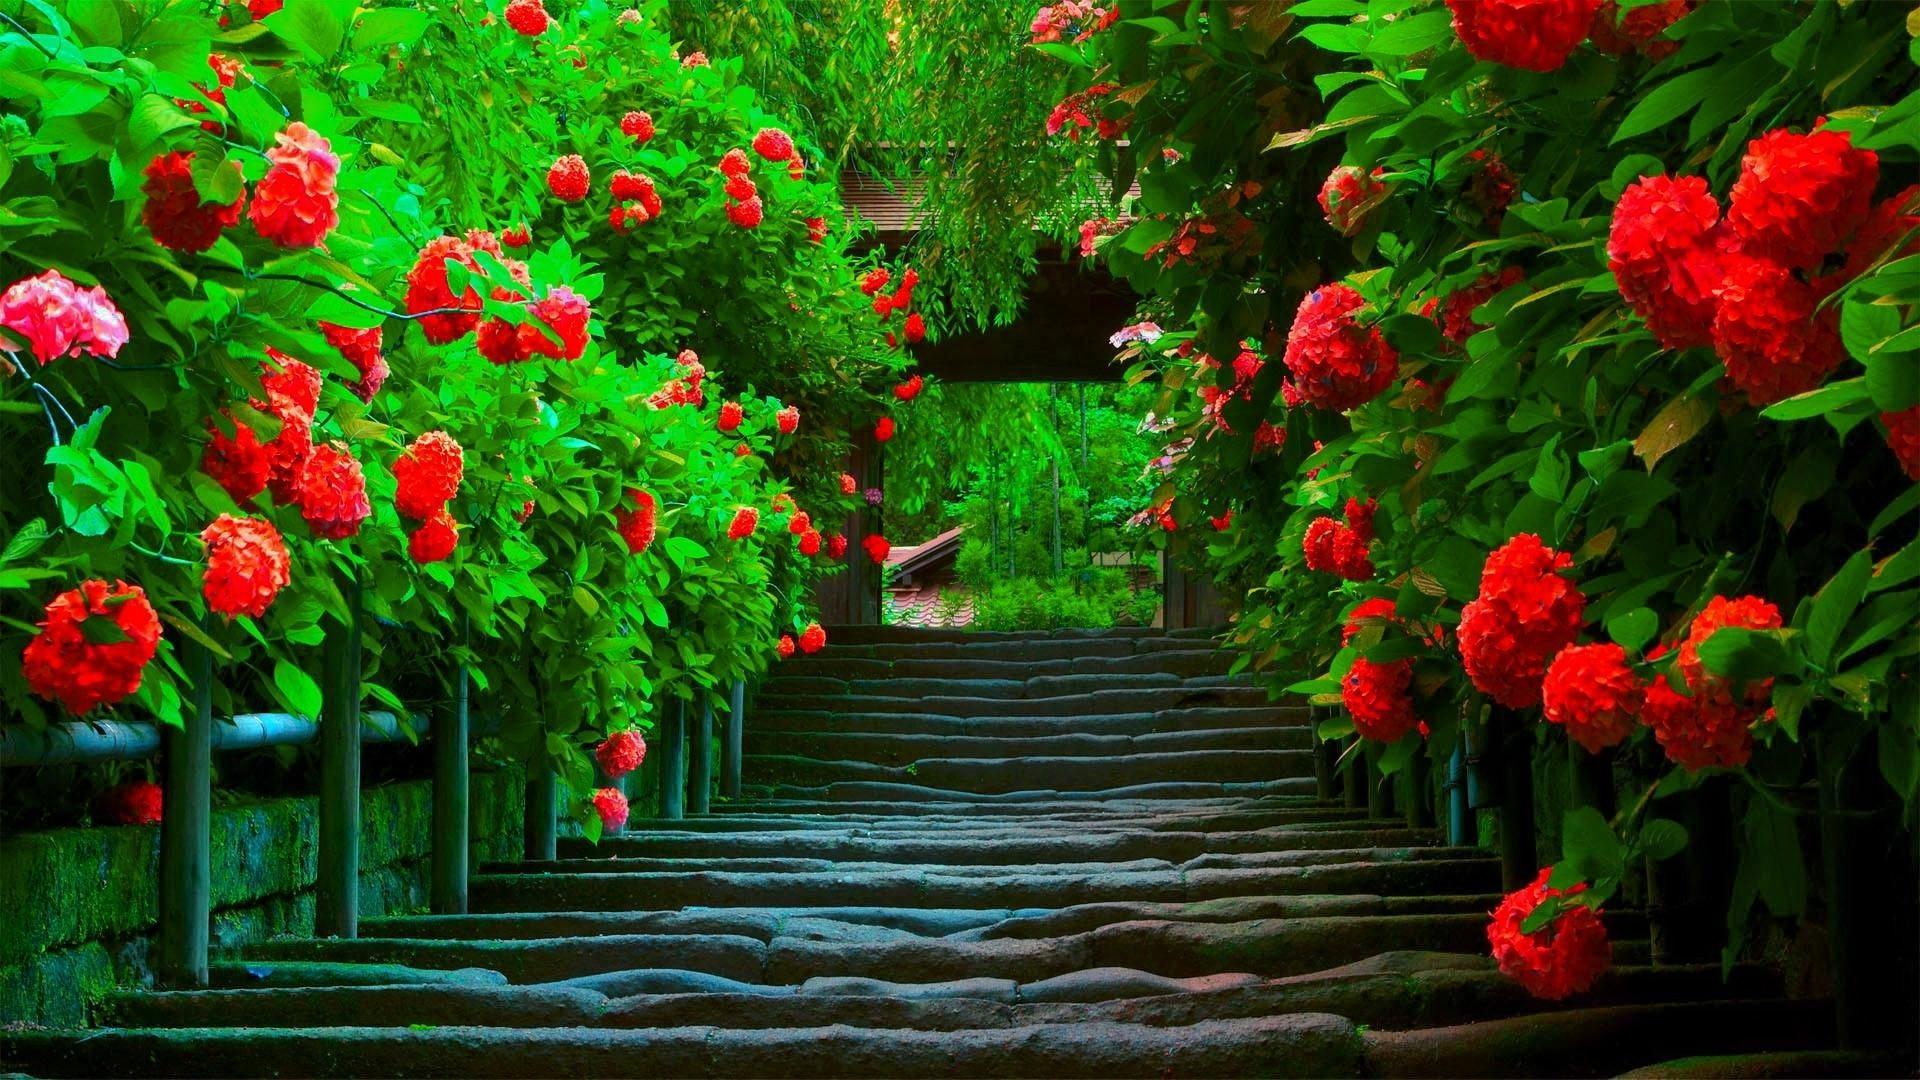 Must see Wallpaper High Resolution Spring - 514925-spring-nature-wallpapers-1920x1080-high-resolution  Snapshot_512095.jpg